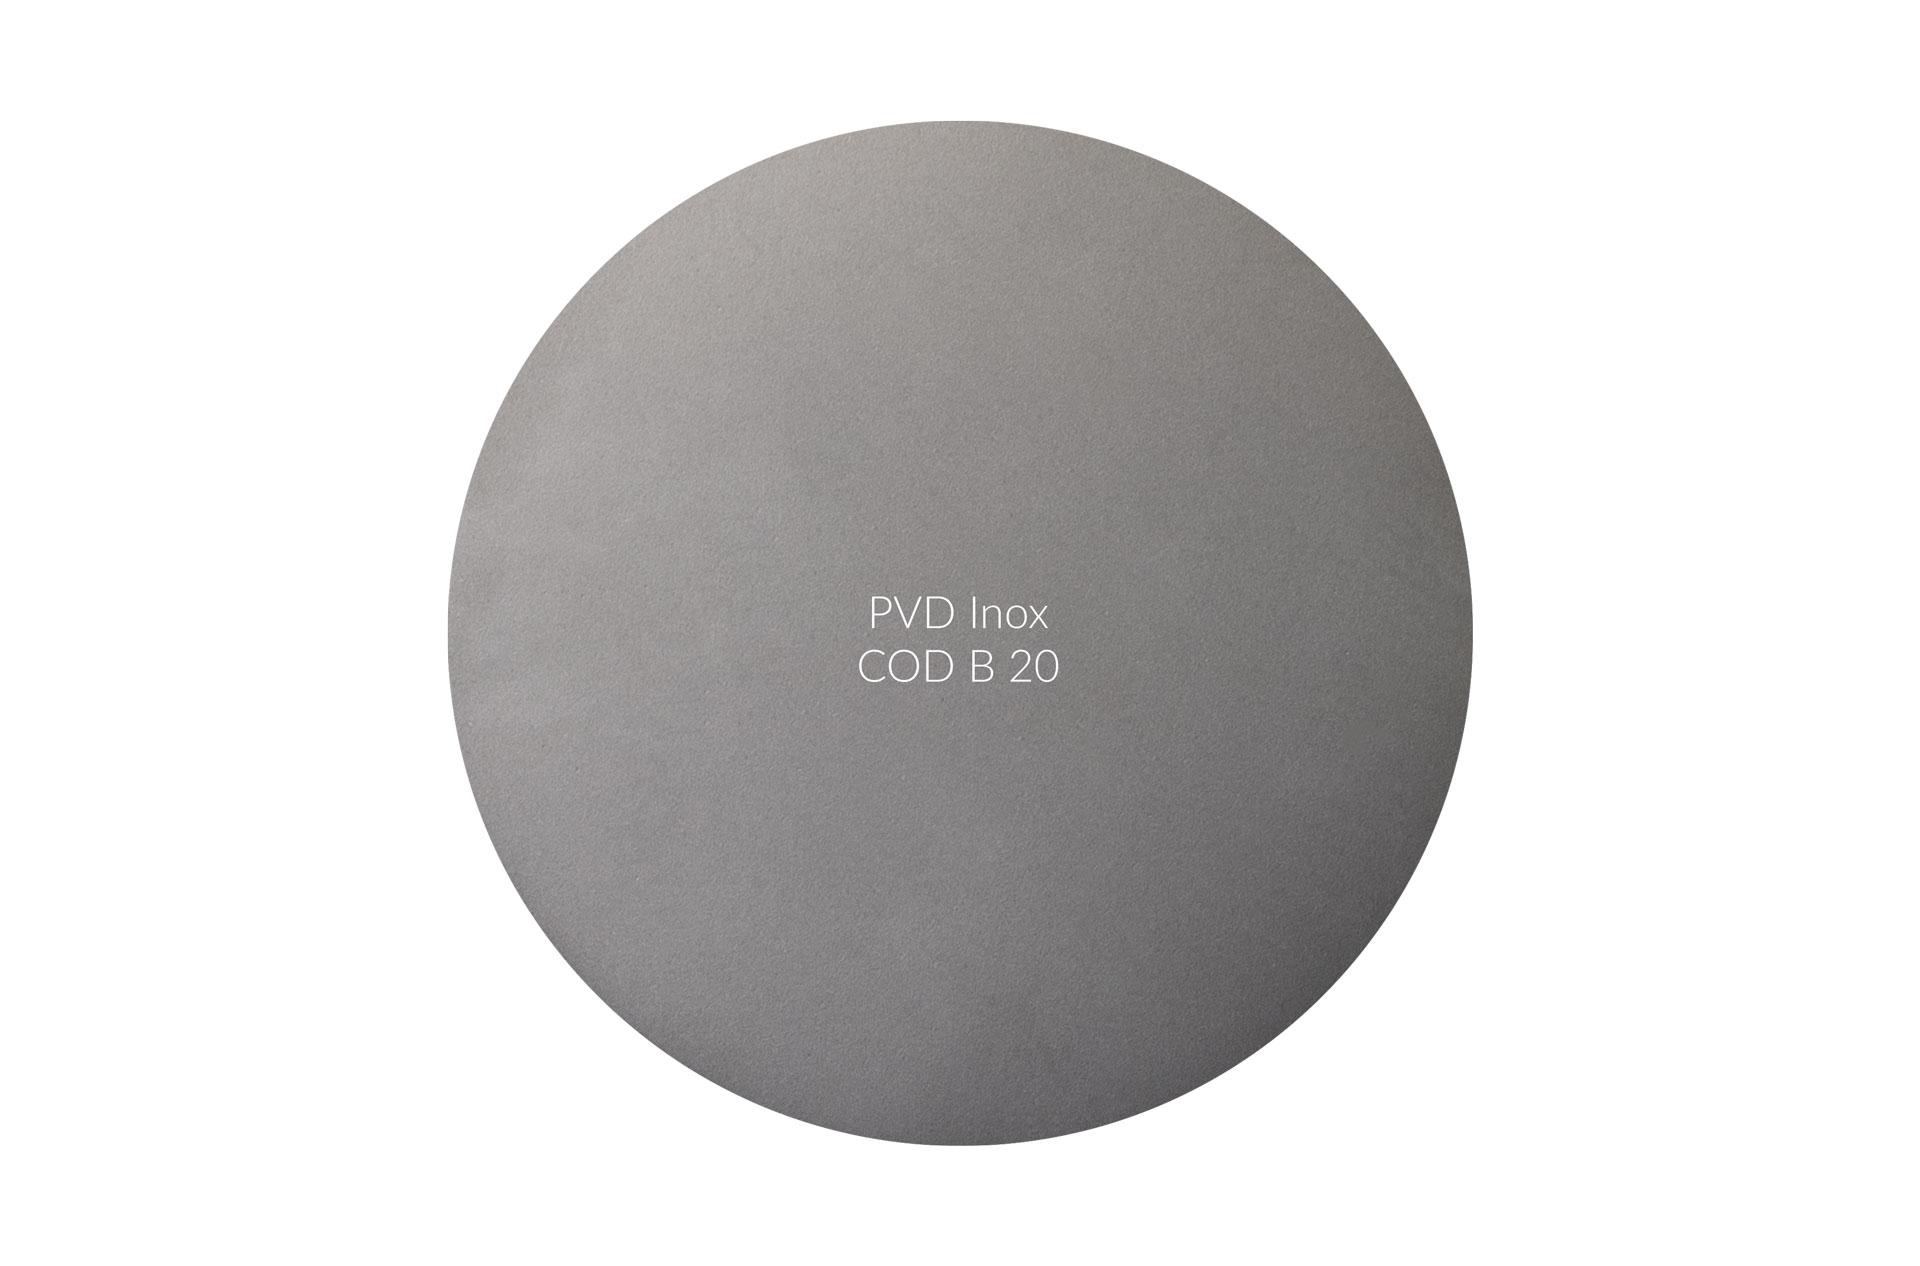 Dischetto PVD inox cod B 20 opaco